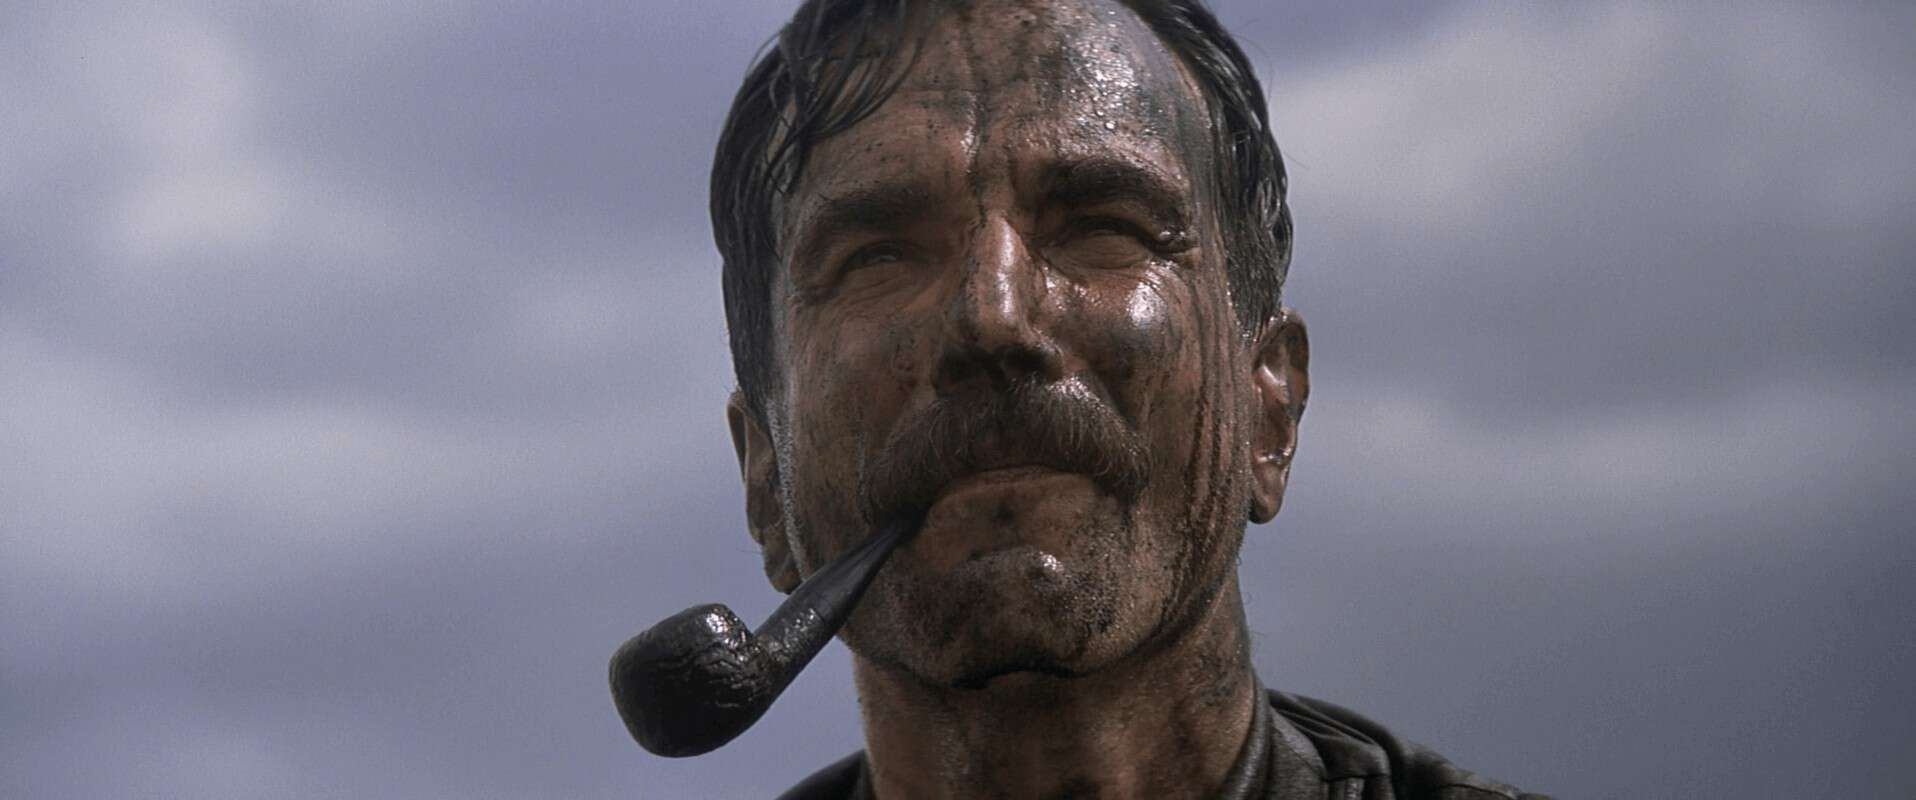 film drammatici il petroliere